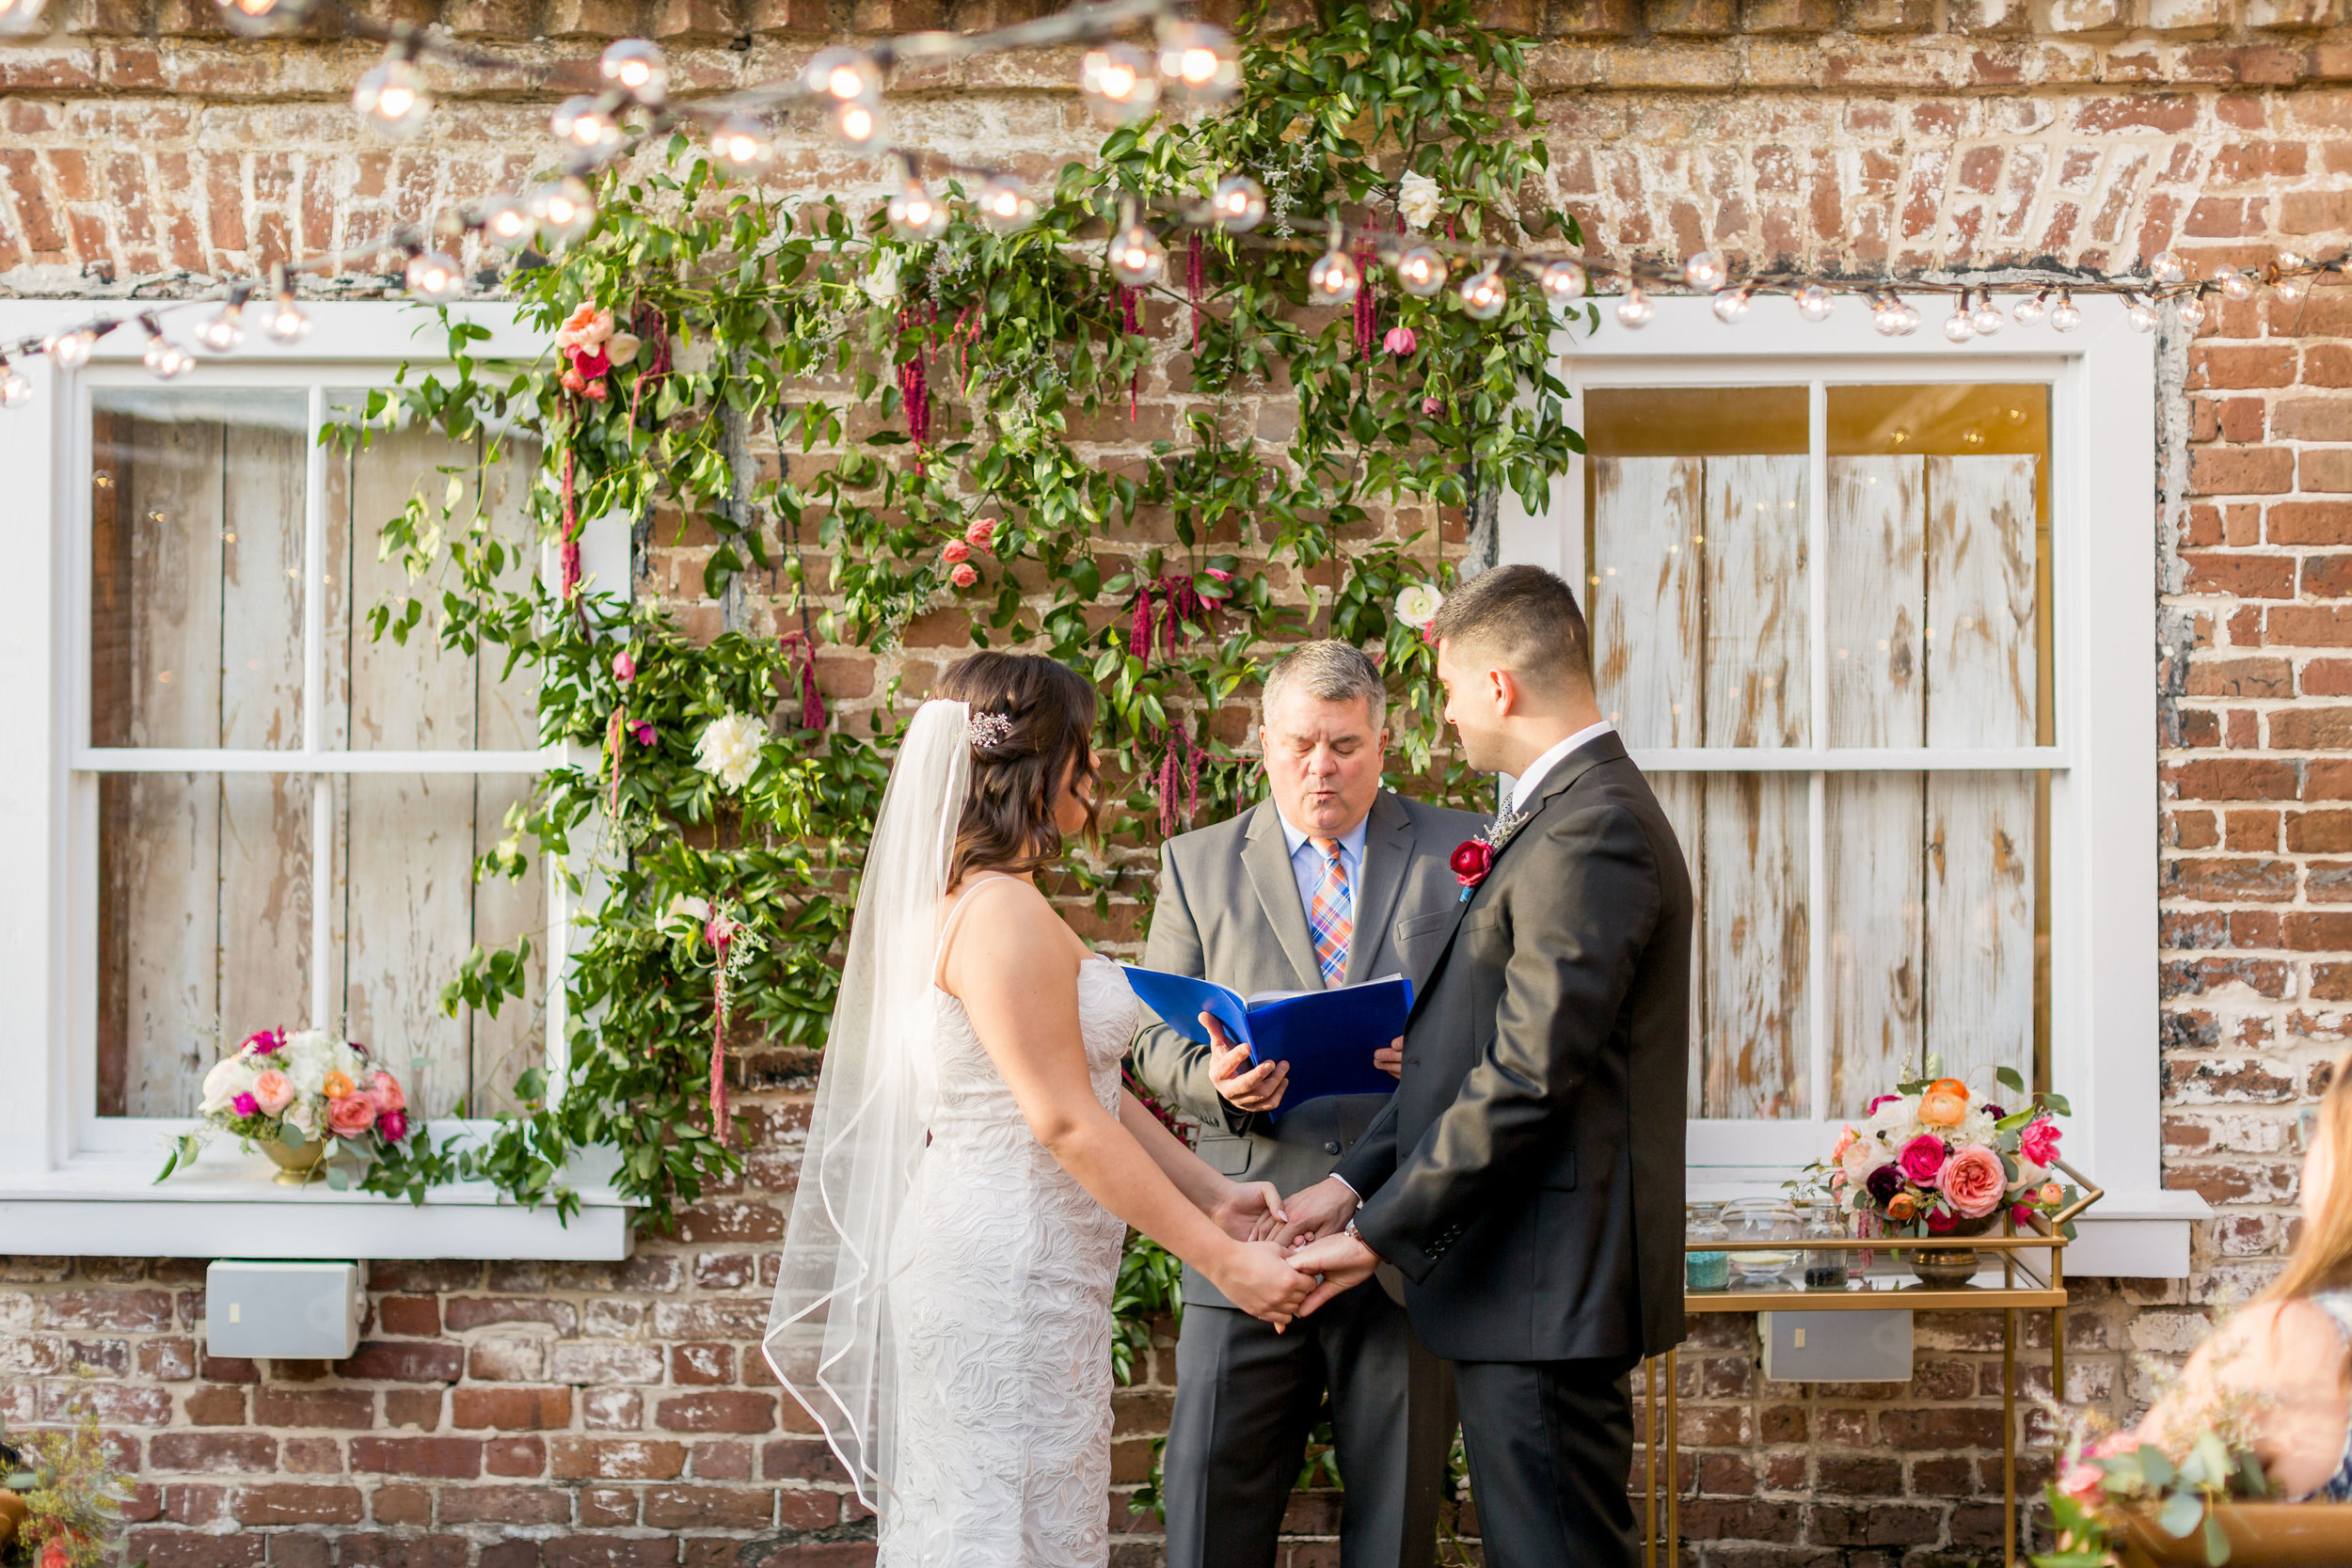 charleston new years elopement popup surprise wedding at upstairs at midtown - scarlet plan & design wedding planners (39).jpg